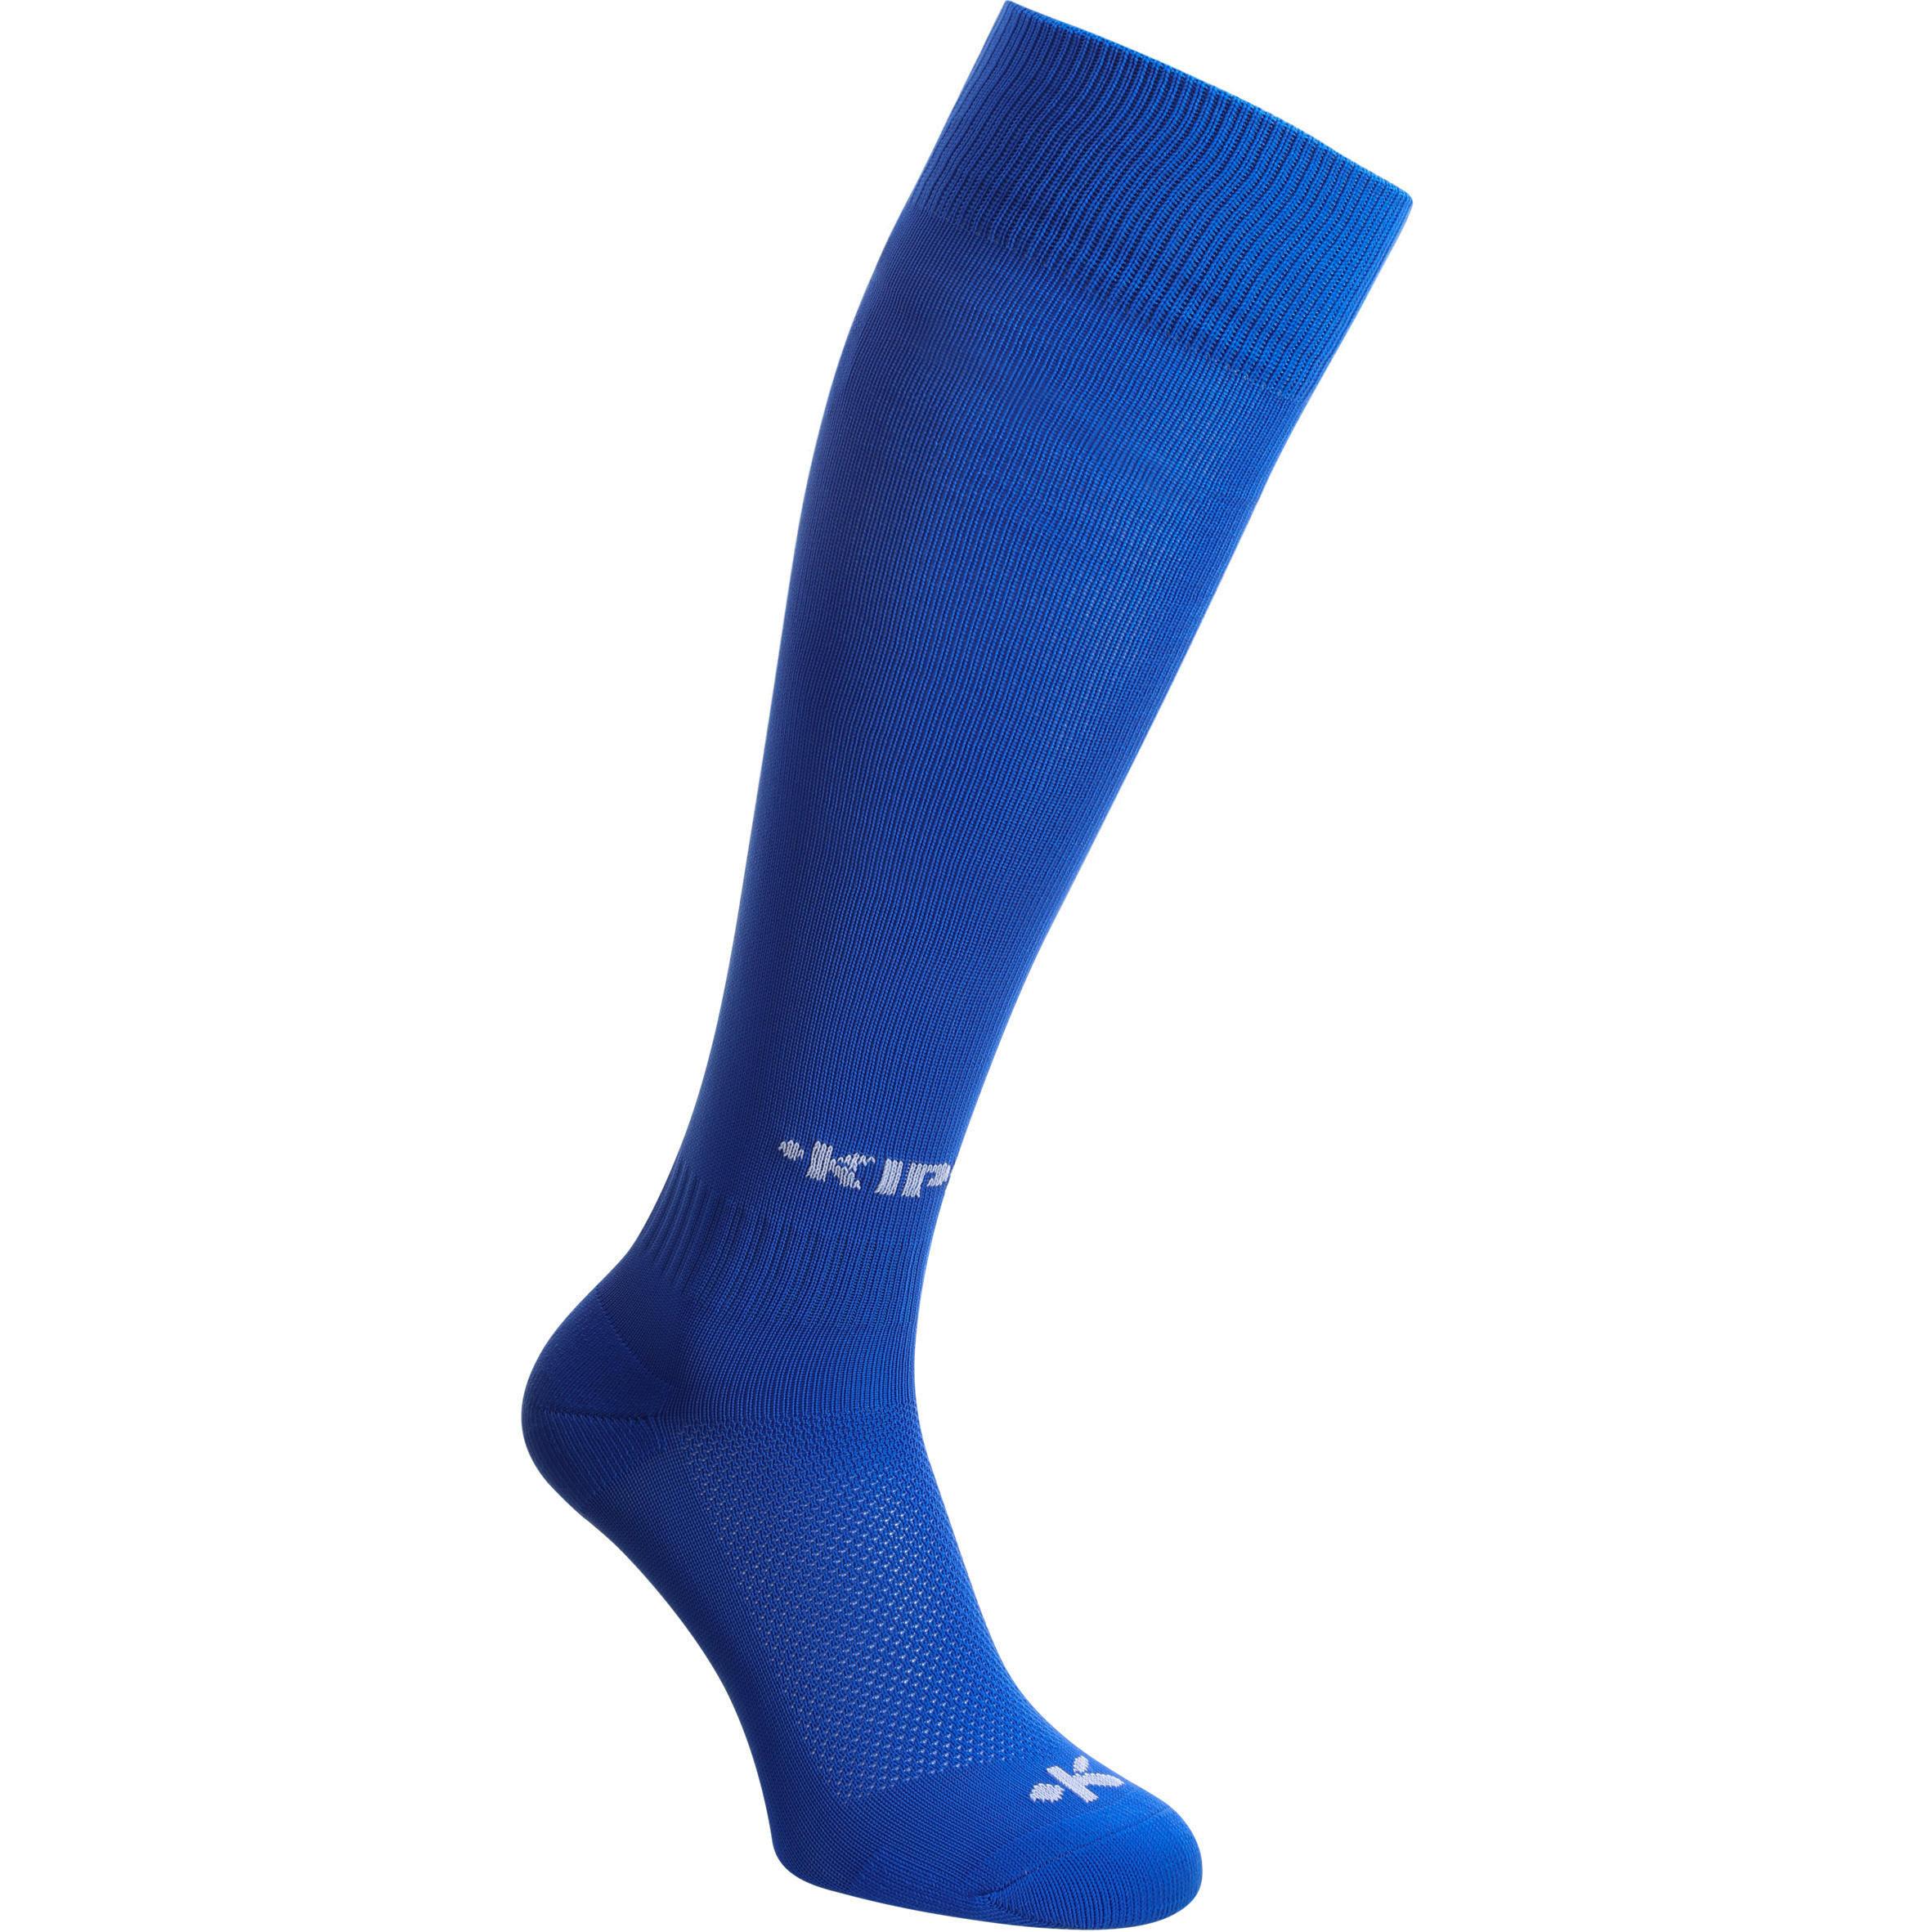 Medias de fútbol niños F100 azul